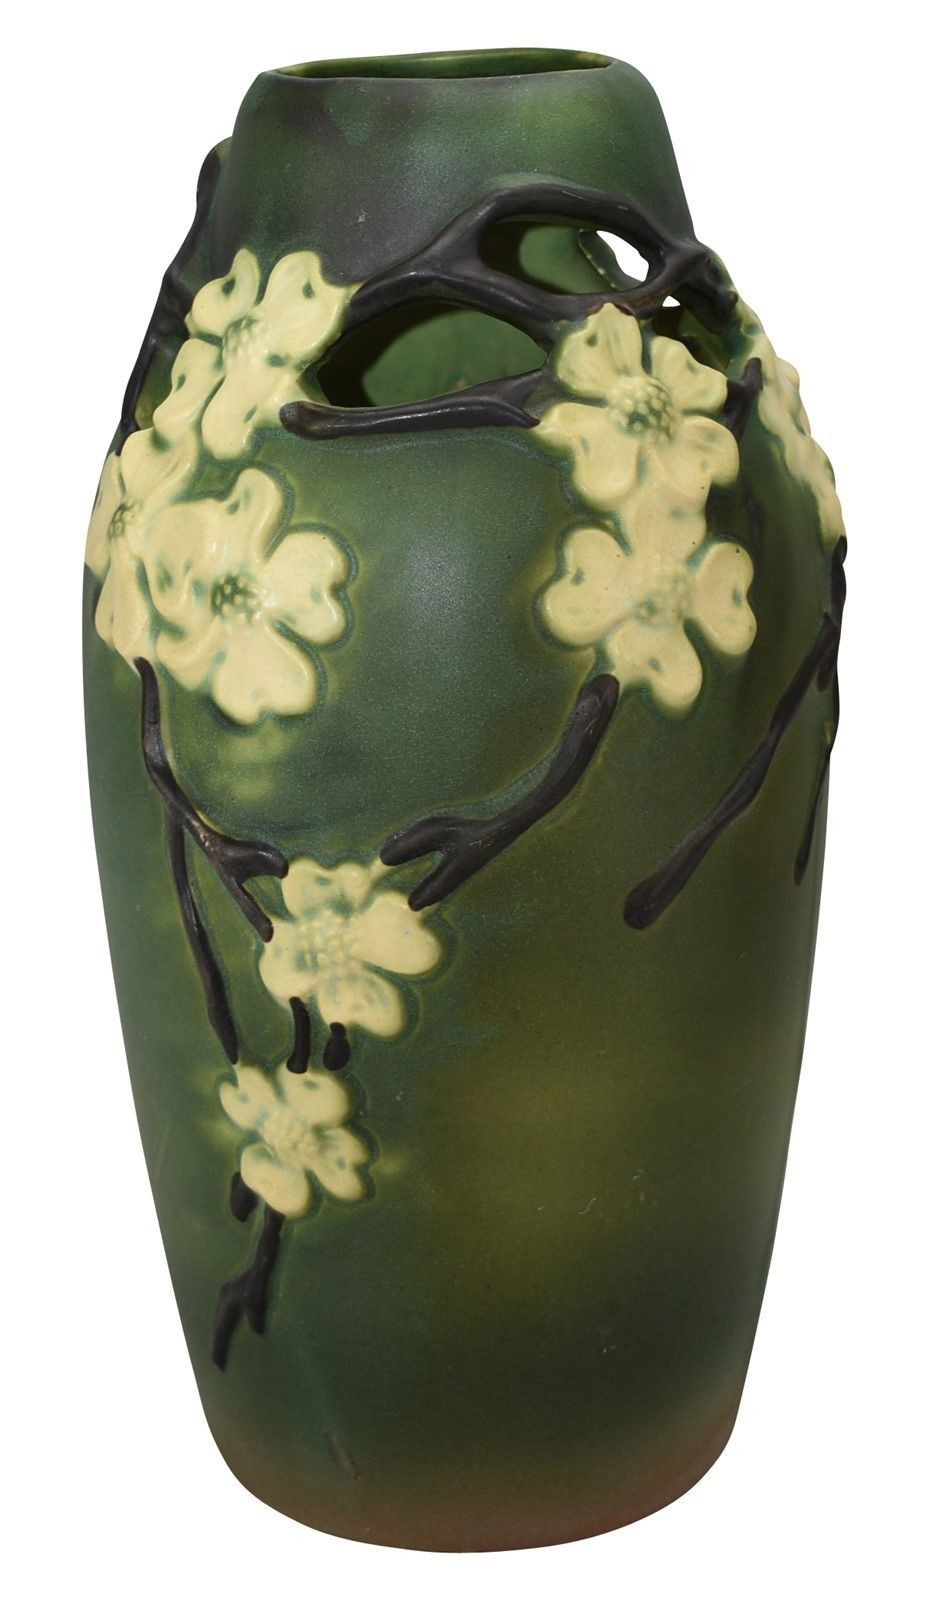 Ebay Vases for Sale Of Roseville Pottery Dogwood Smooth Reticulated Vase 140 15 Ebay Intended for Roseville Pottery Dogwood Smooth Reticulated Vase 140 15 Ebay